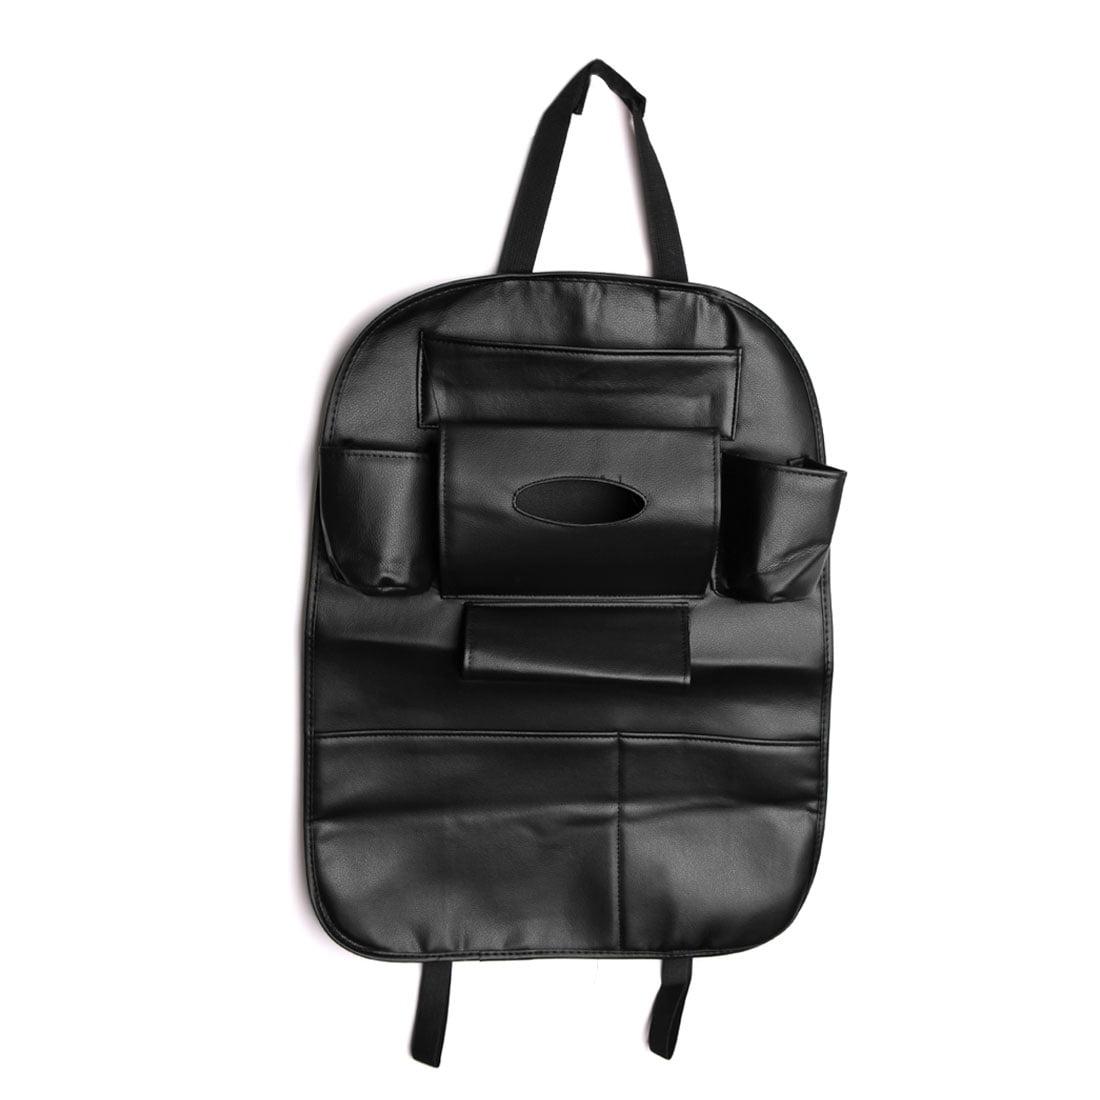 Black Auto Car Seat Back Cover Pouch Organizer Holder Multi-Pockets Storage Bag